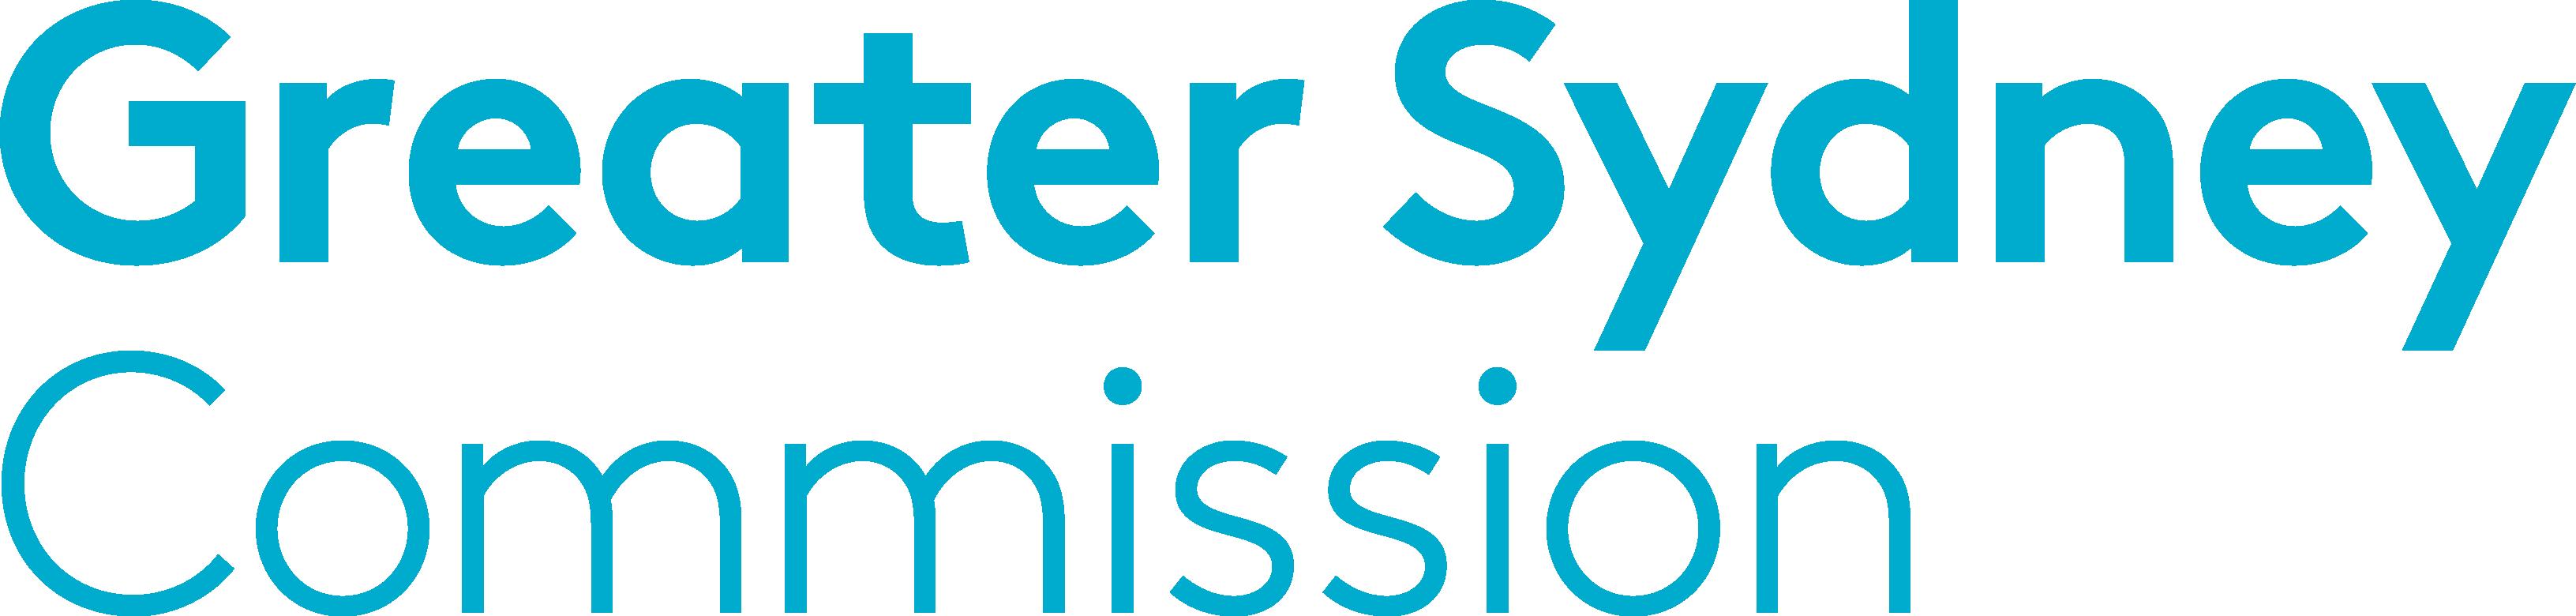 Greater Sydney Commission logo